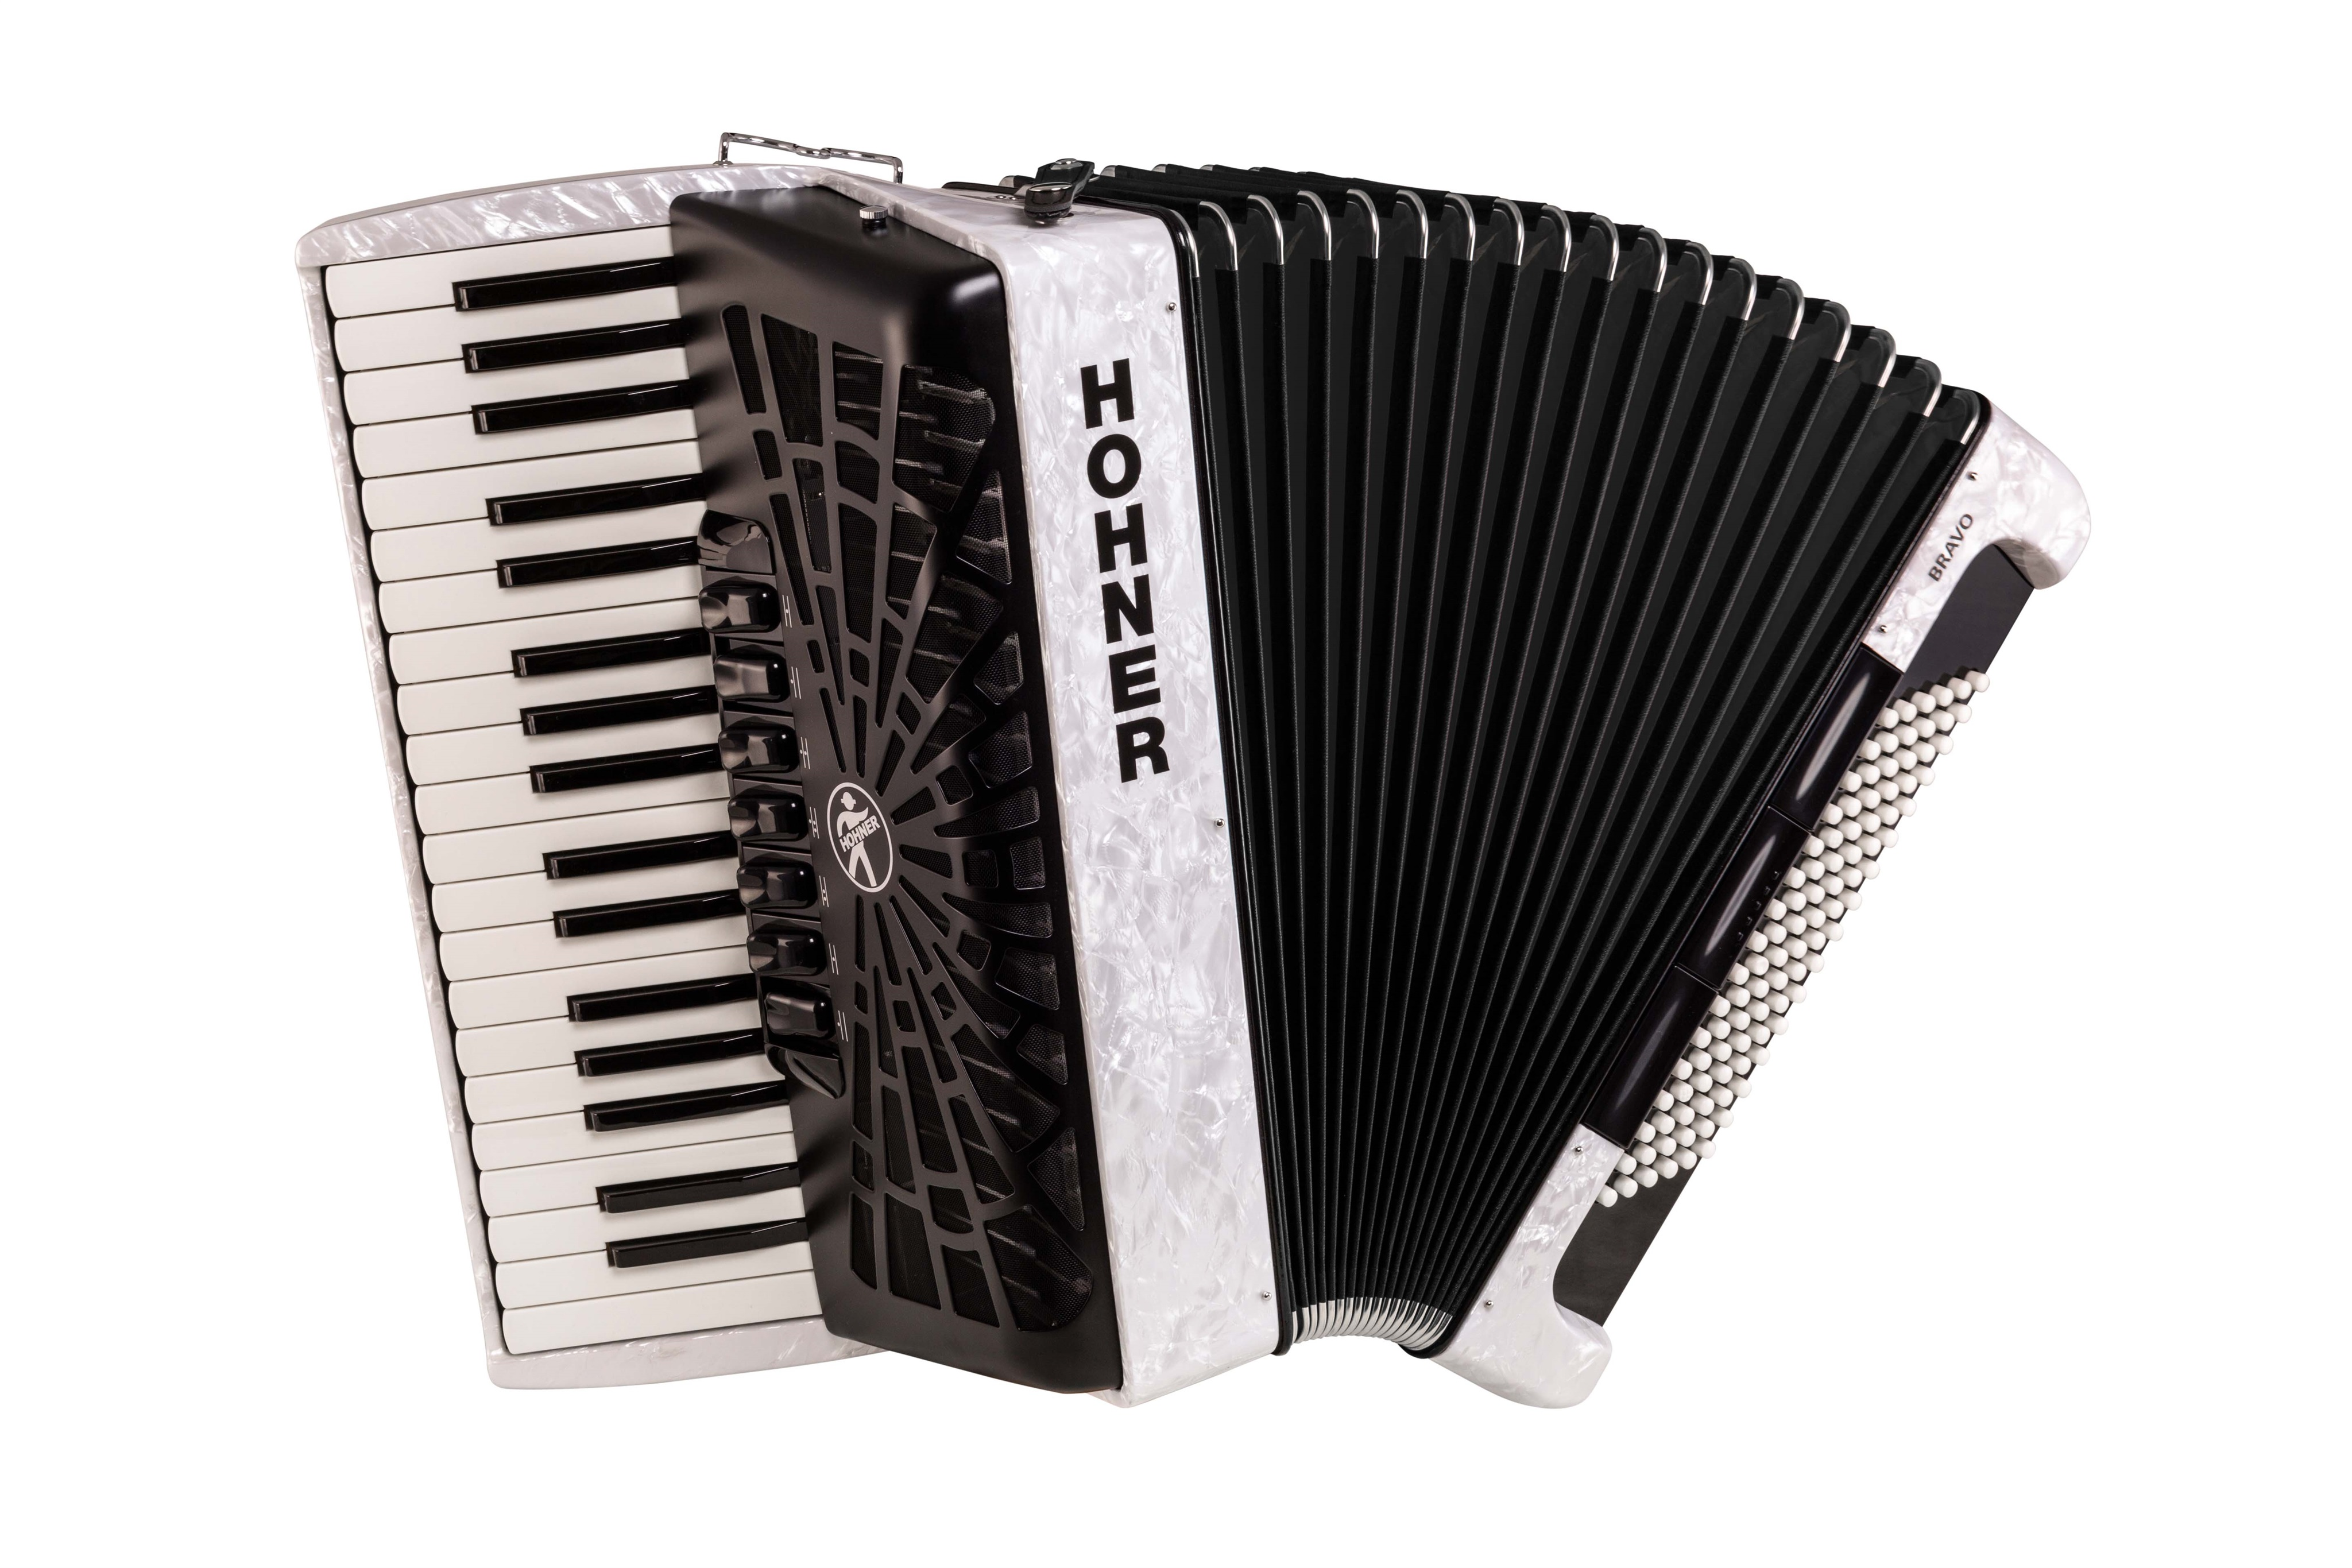 Hohner Bravo III 96 white (SilentKey)